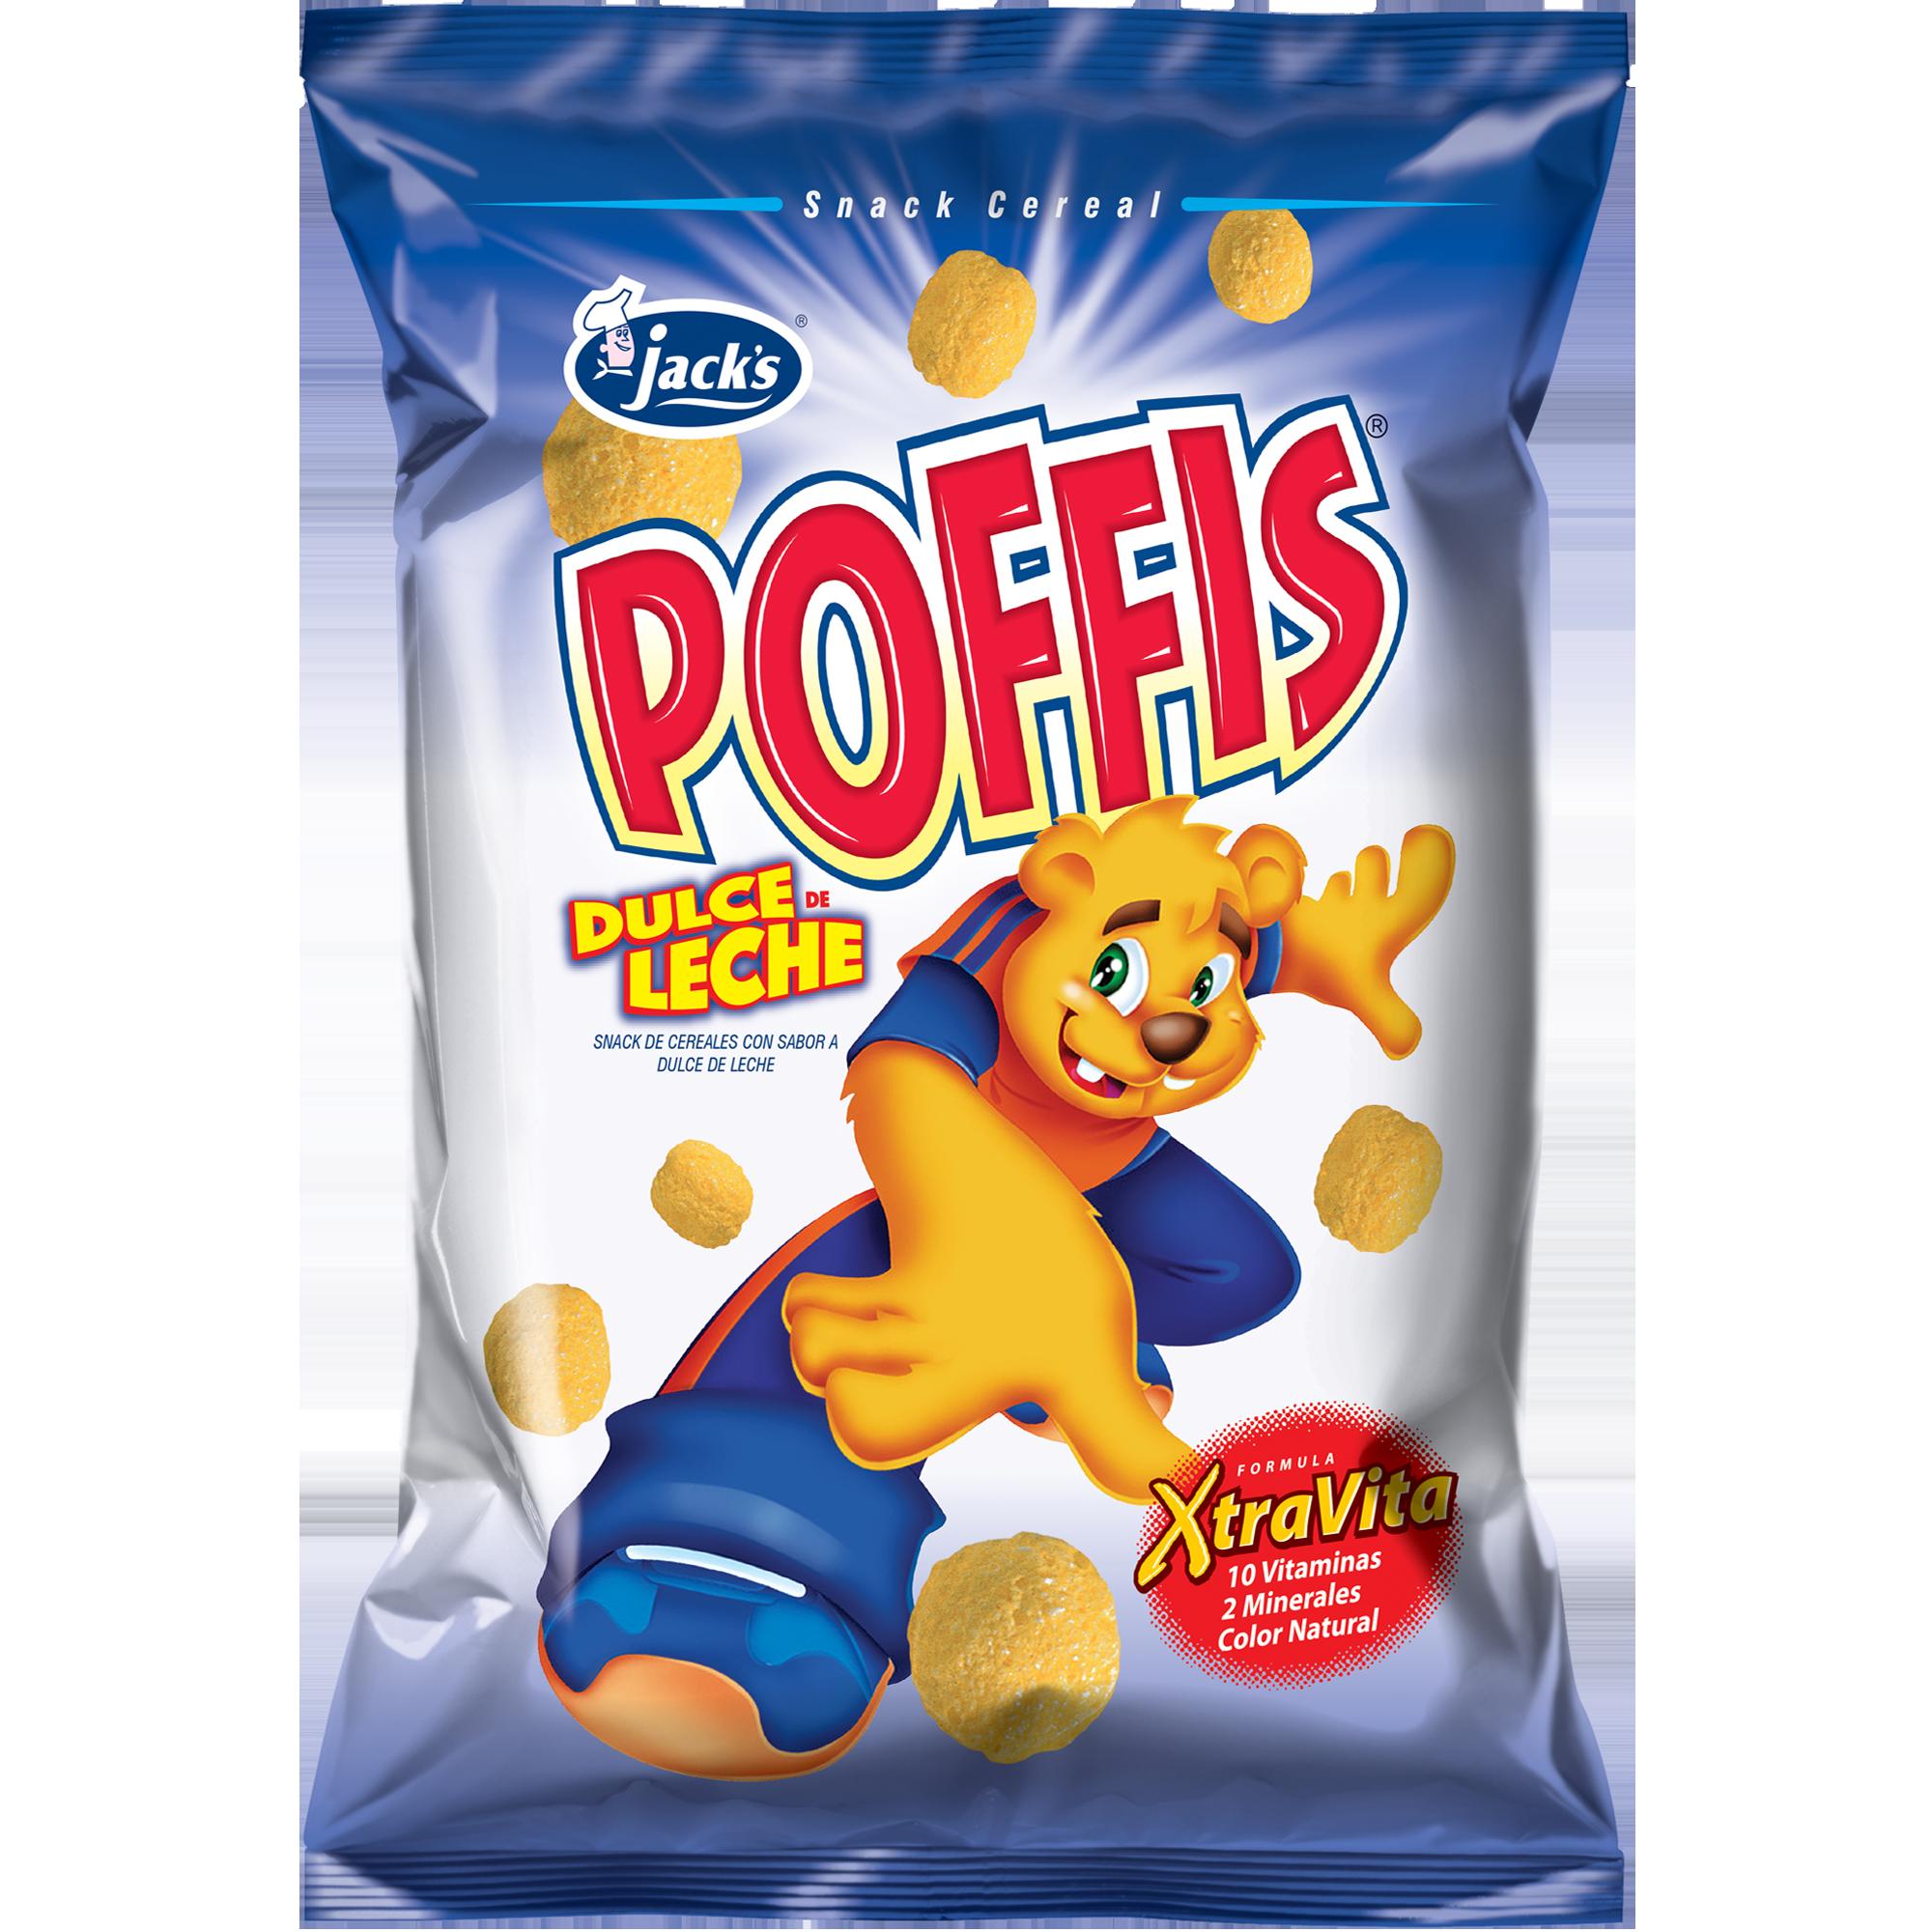 POFFIS-indiv-pag-web